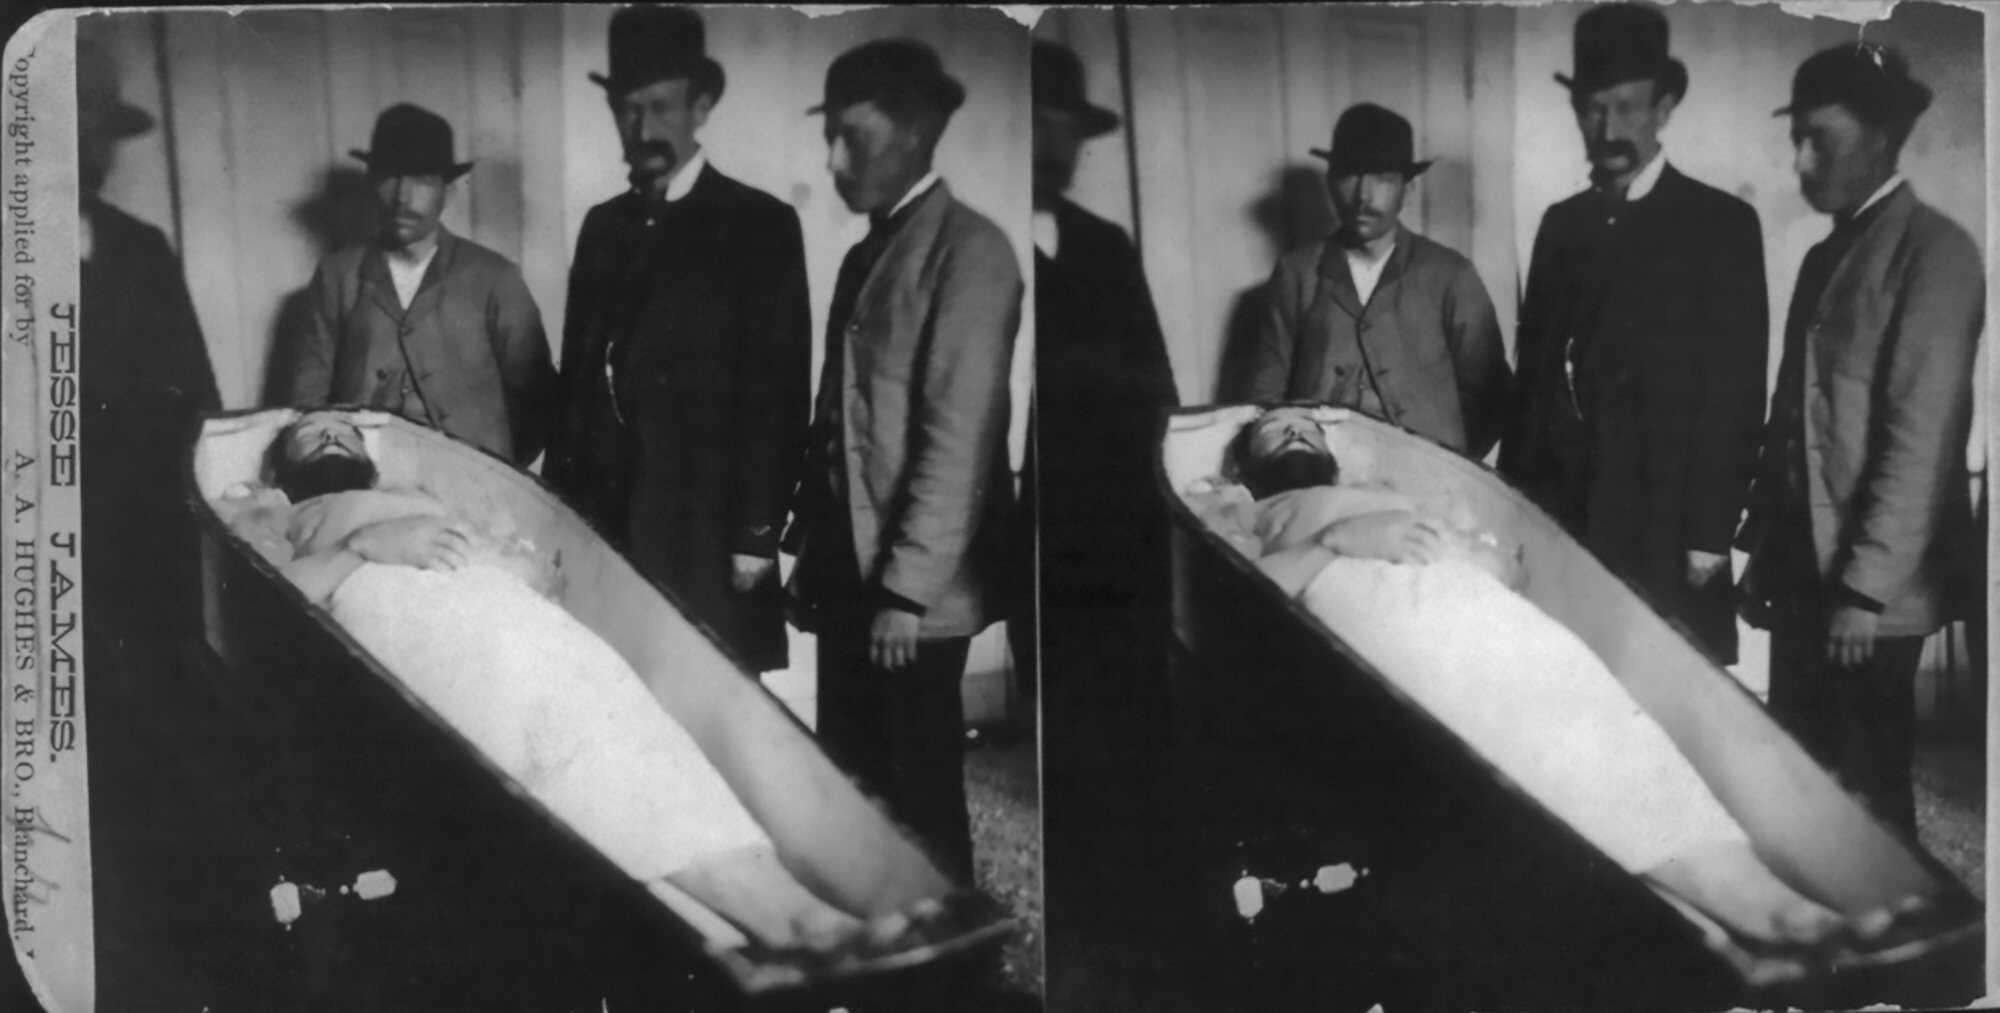 James-funeral-dead in coffin 1882 LOC.jpg